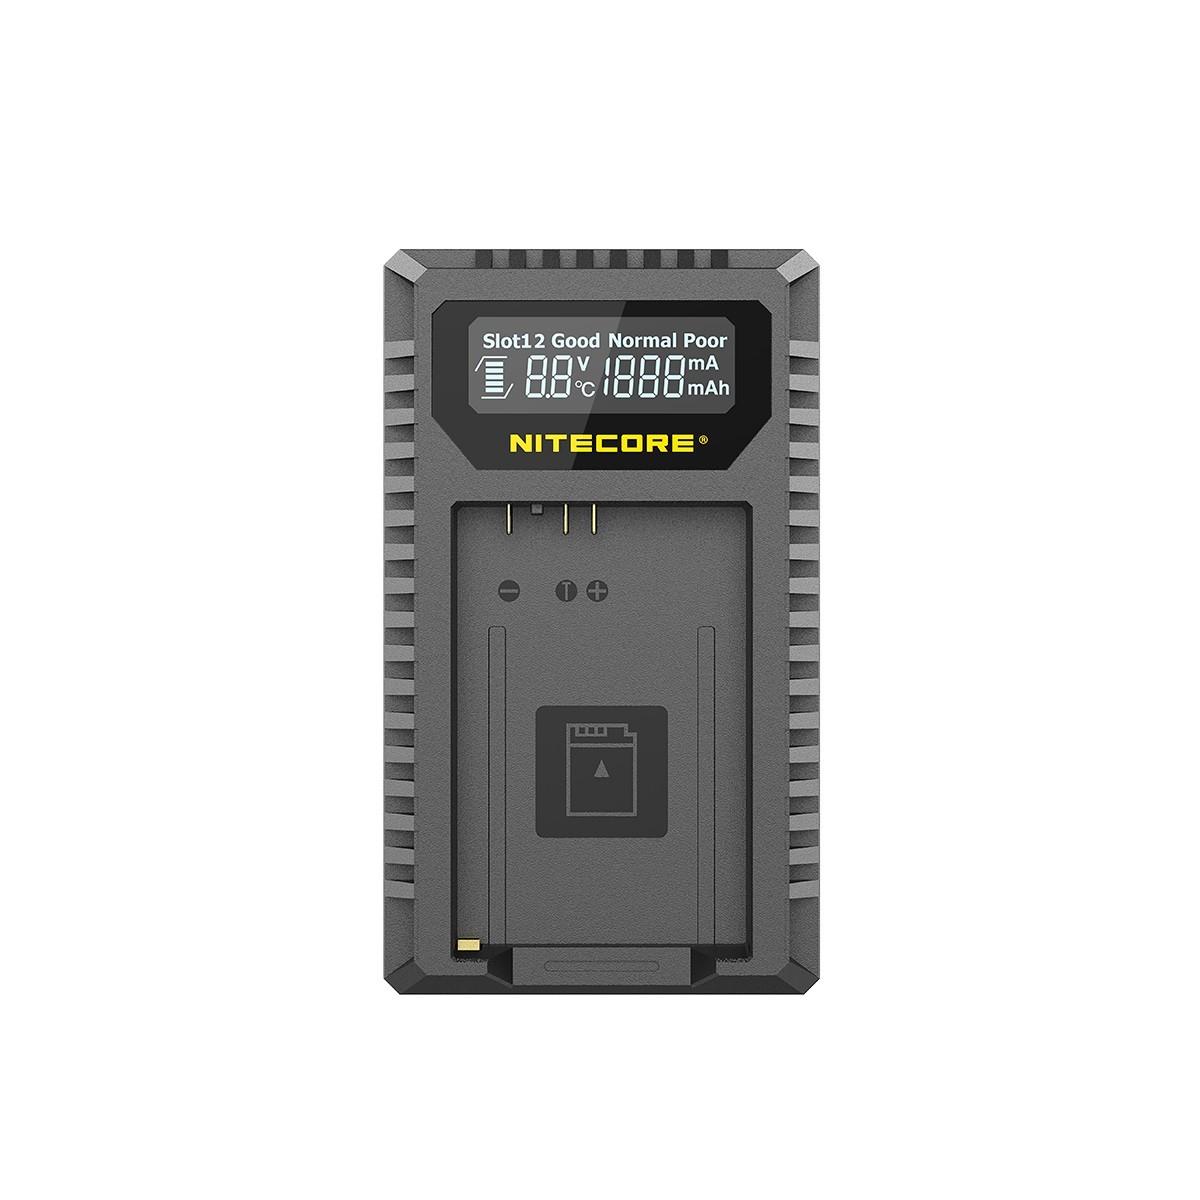 Nitecore UCN5 Dual Slot USB-C QC Digital Charger for Canon LP-E17 Batteries